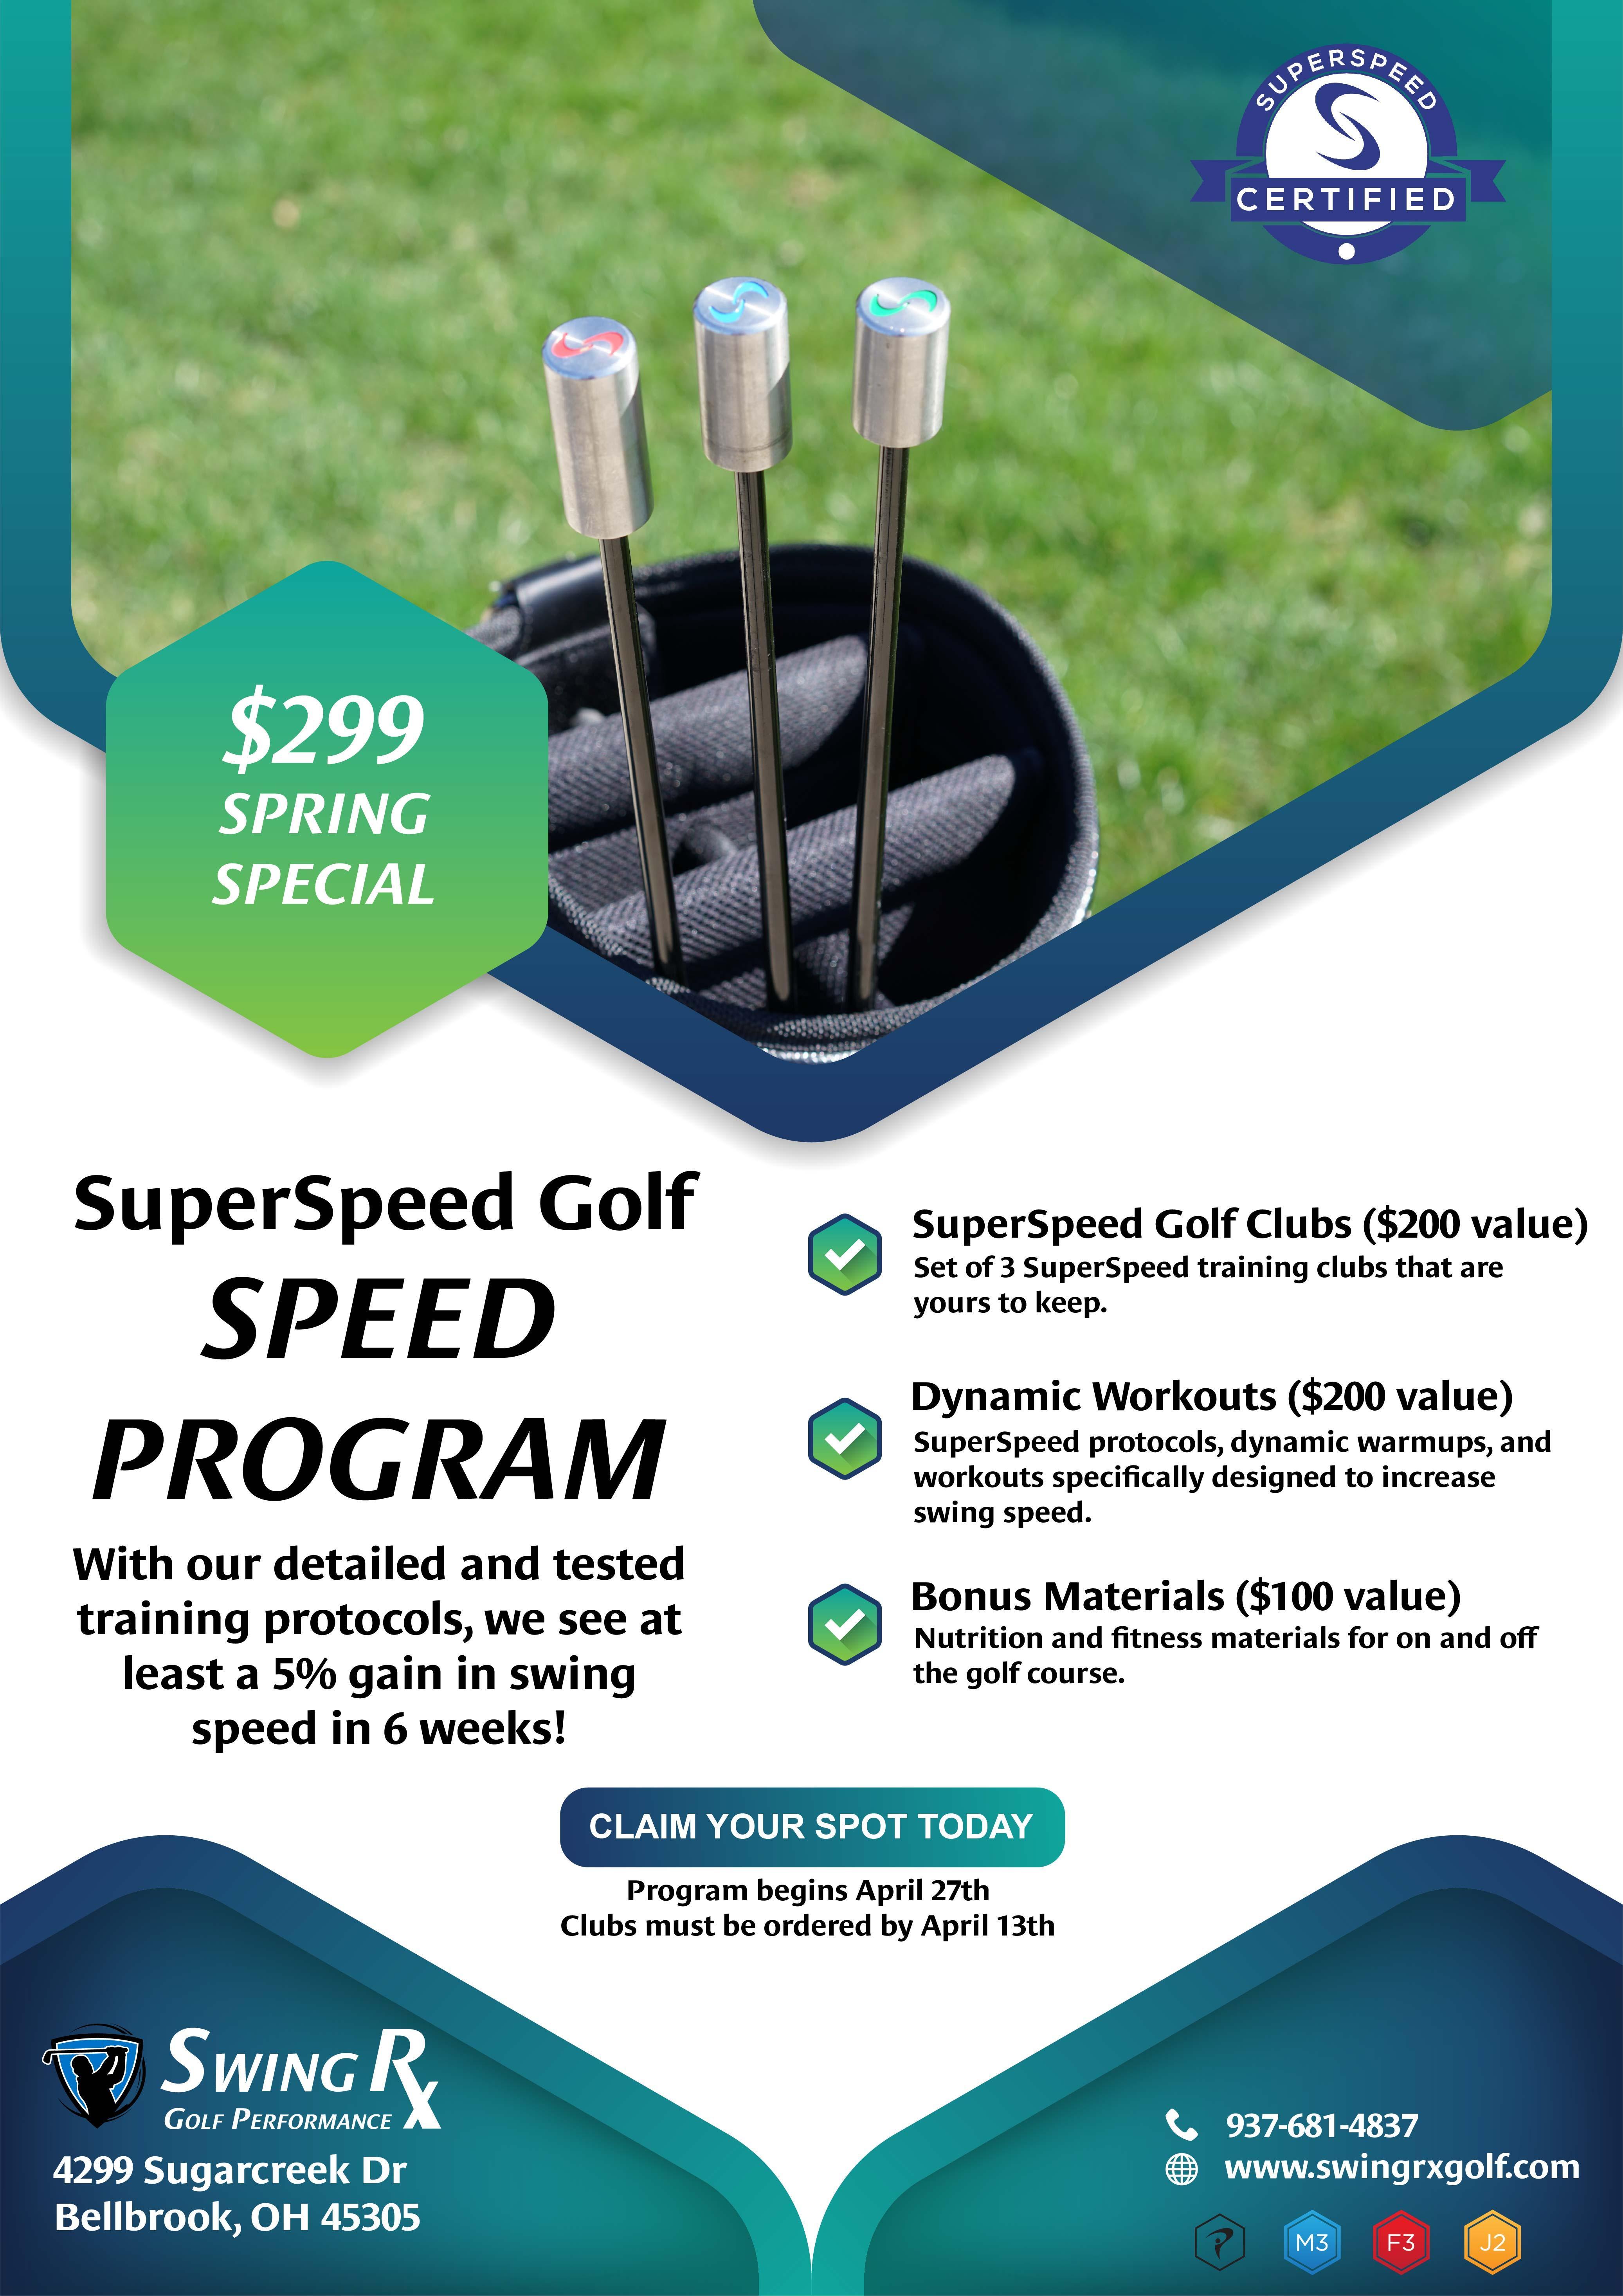 SuperSpeed Golf - Swing Speed Program